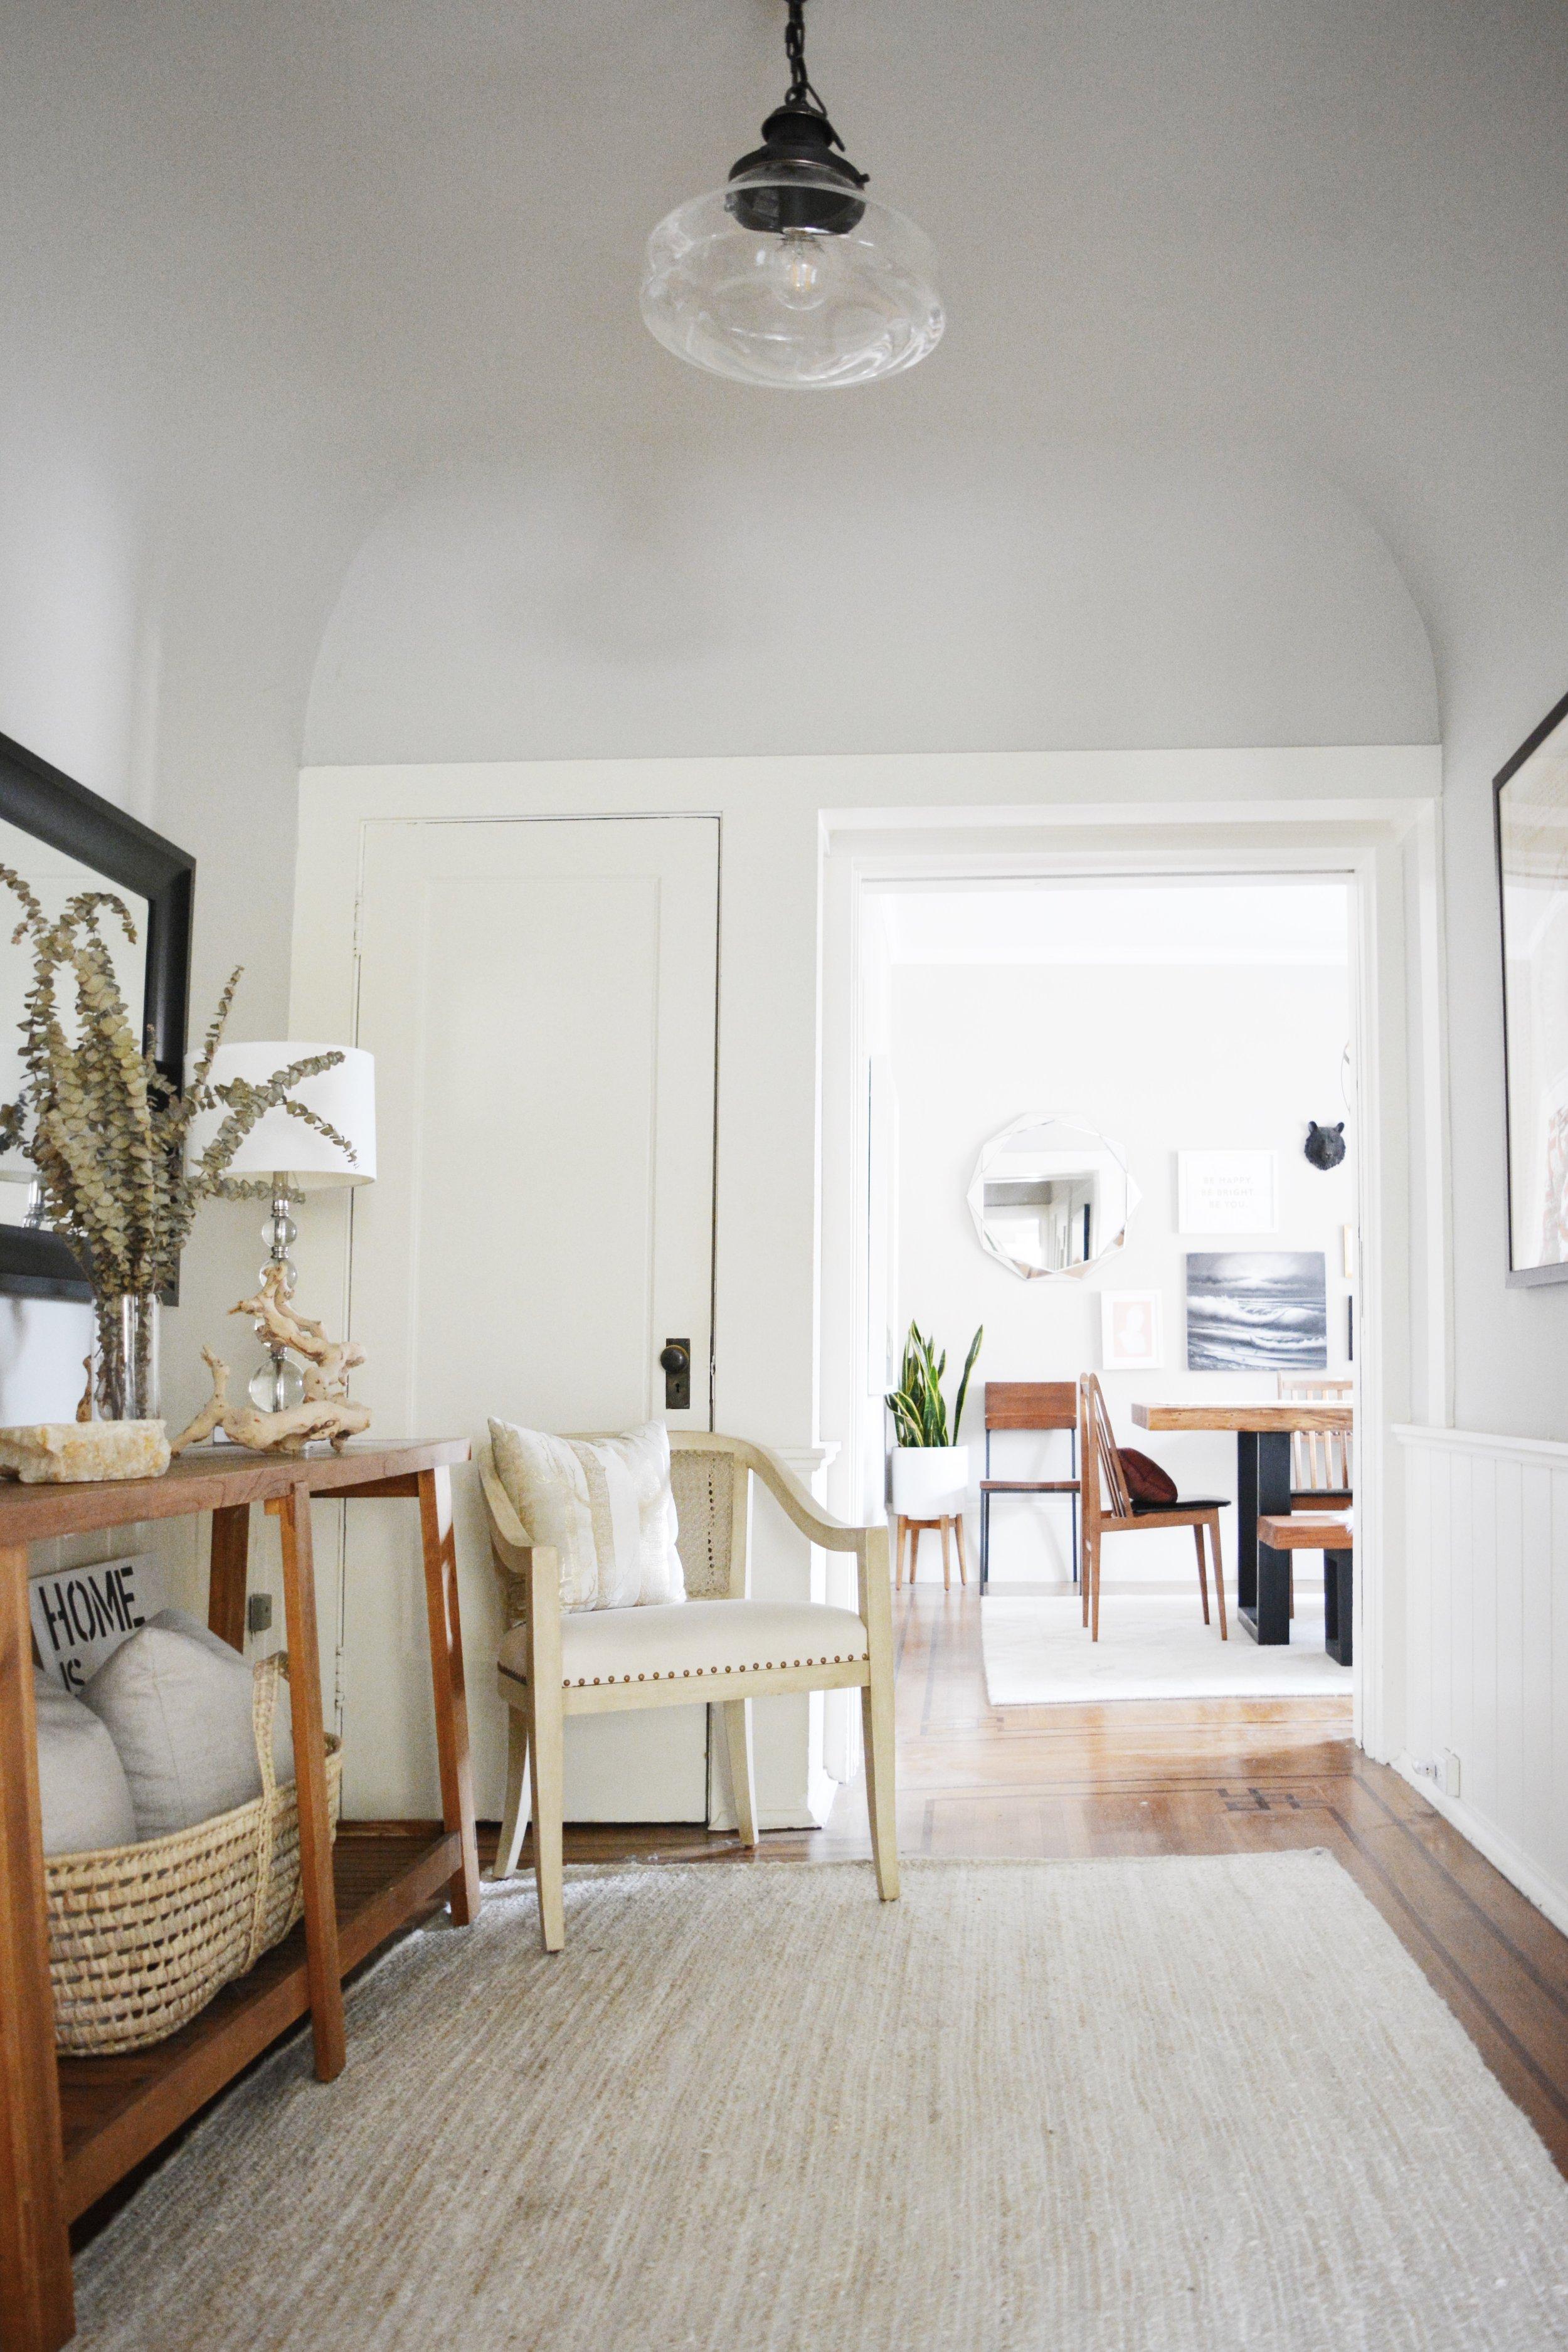 Angela Grace Design // Filbert Foyer // San Francisco and SF Bay Area Interior Designer, Decorator